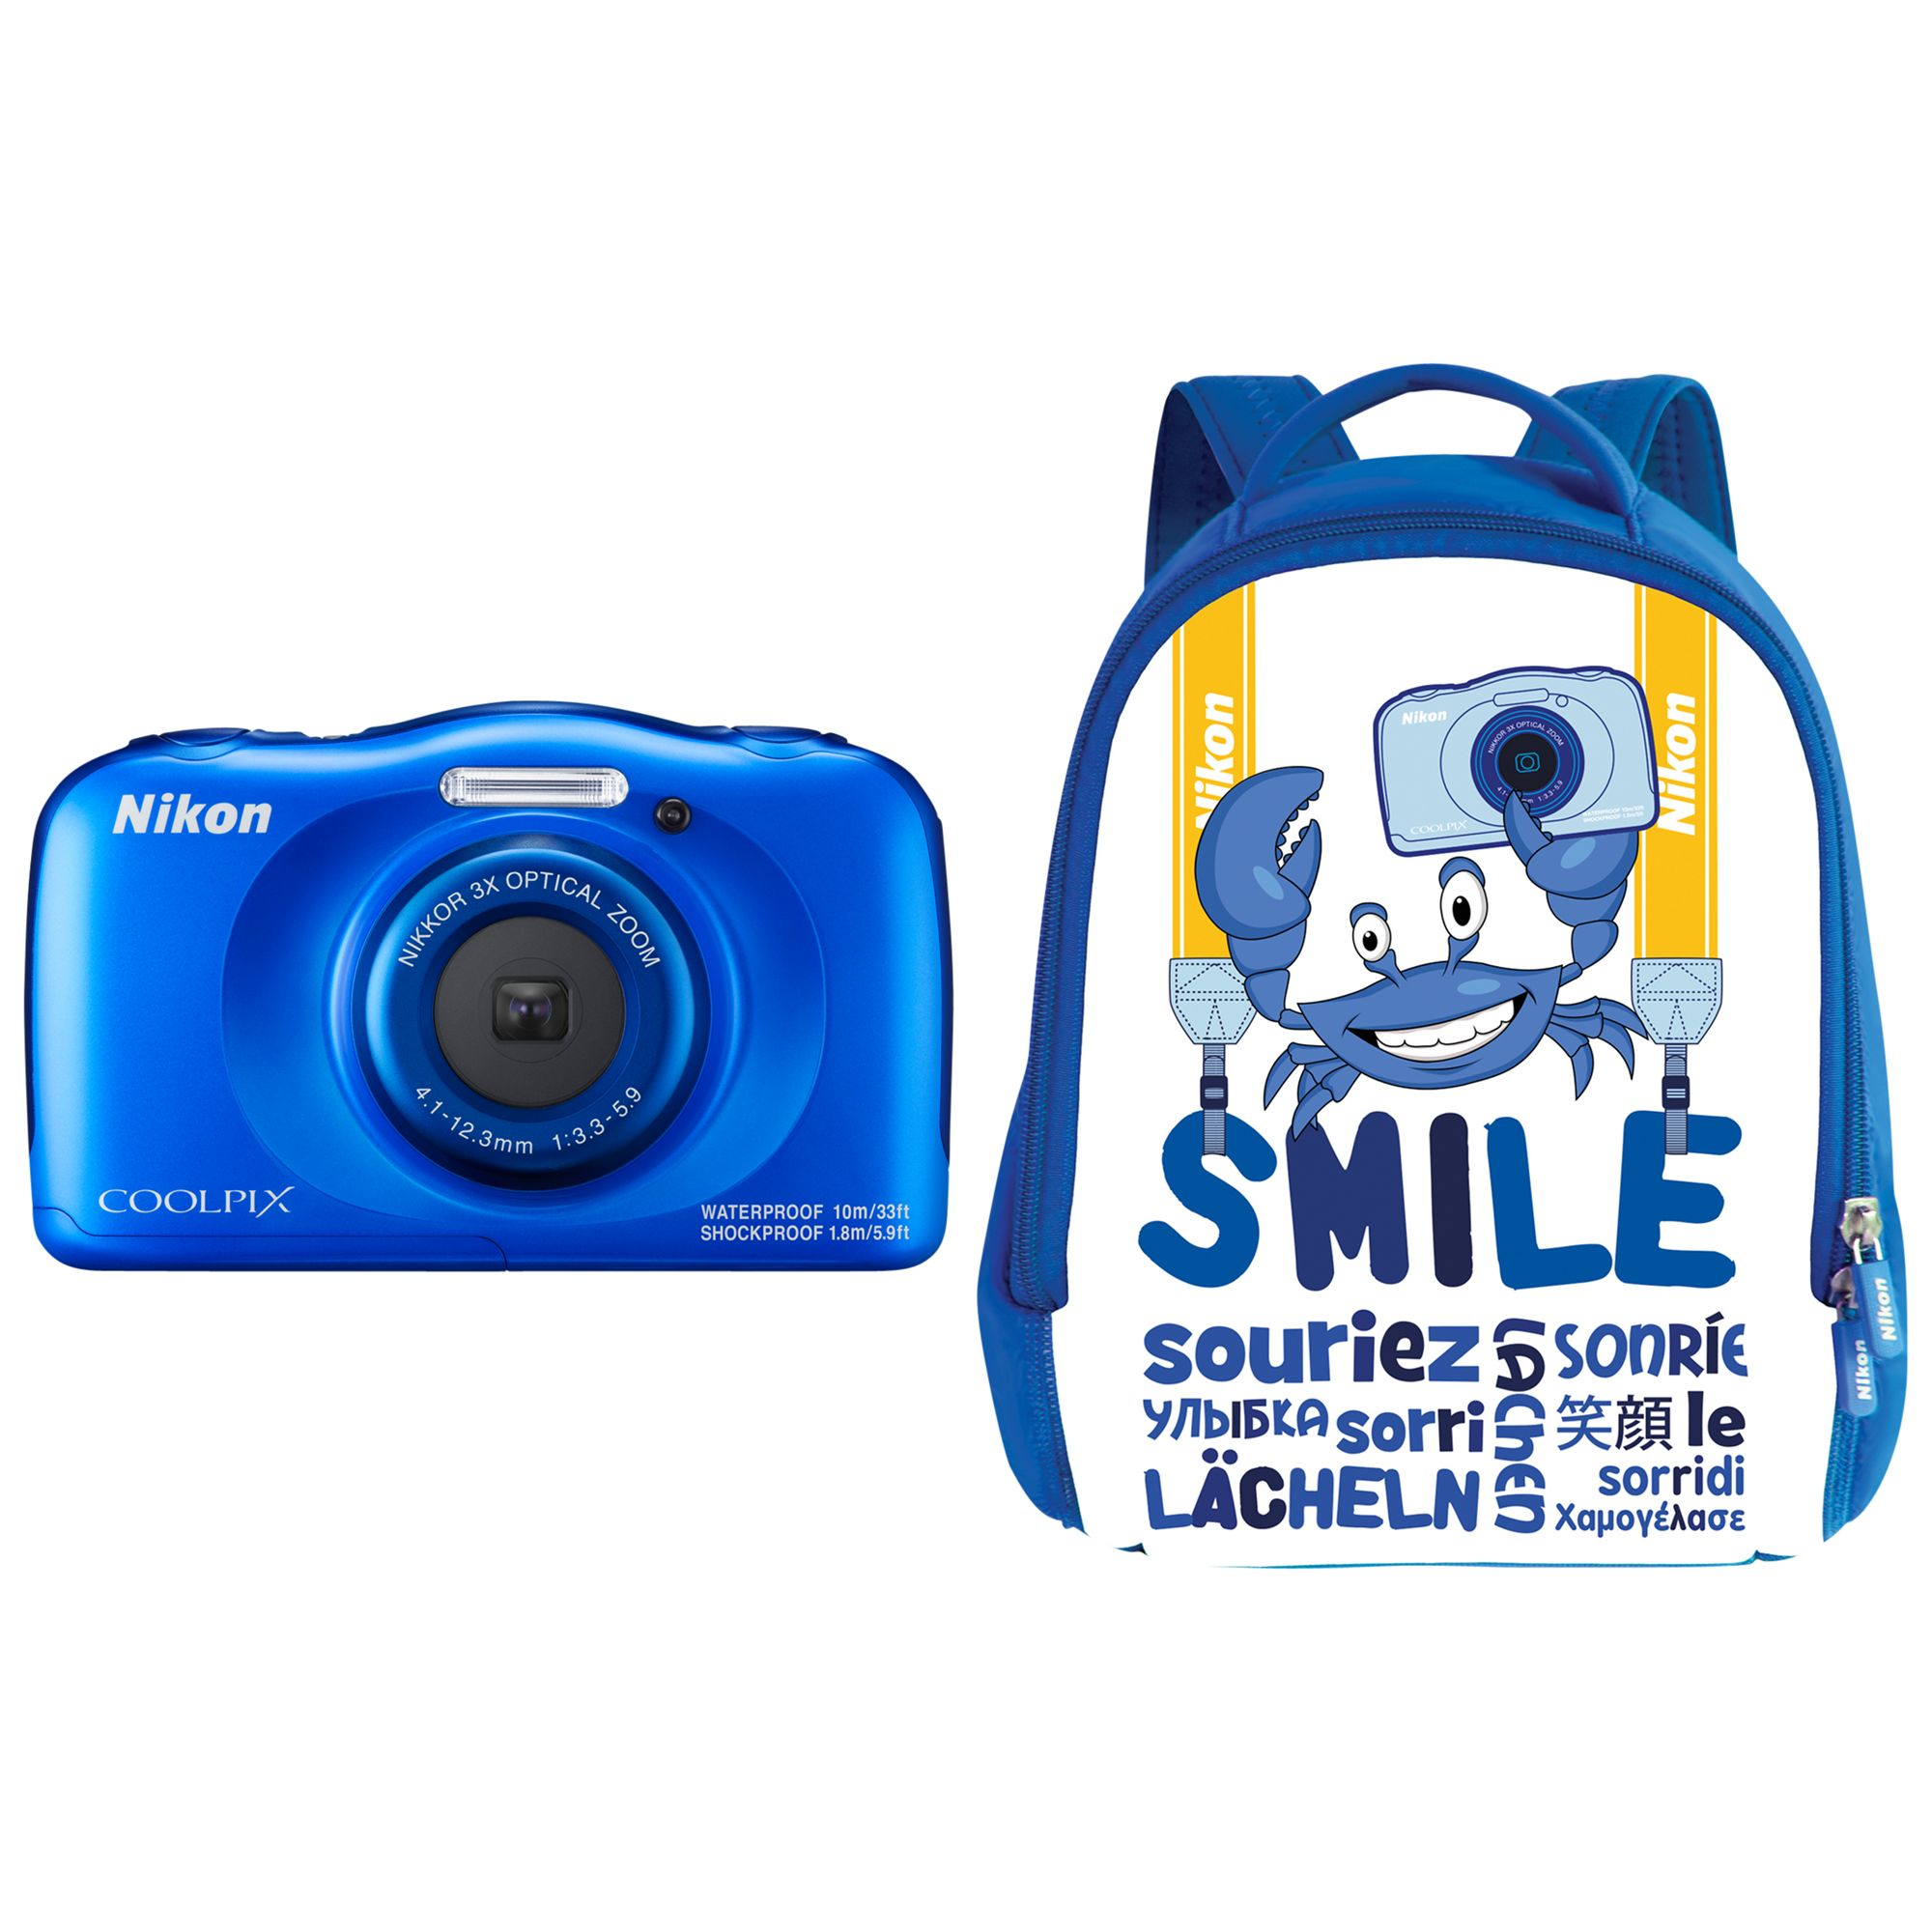 Nikon Nikon COOLPIX W100 Waterproof Digital Camera, 13.2MP, HD 1080p, 3x Optical Zoom, Bluetooth & 2.7 LCD Screen